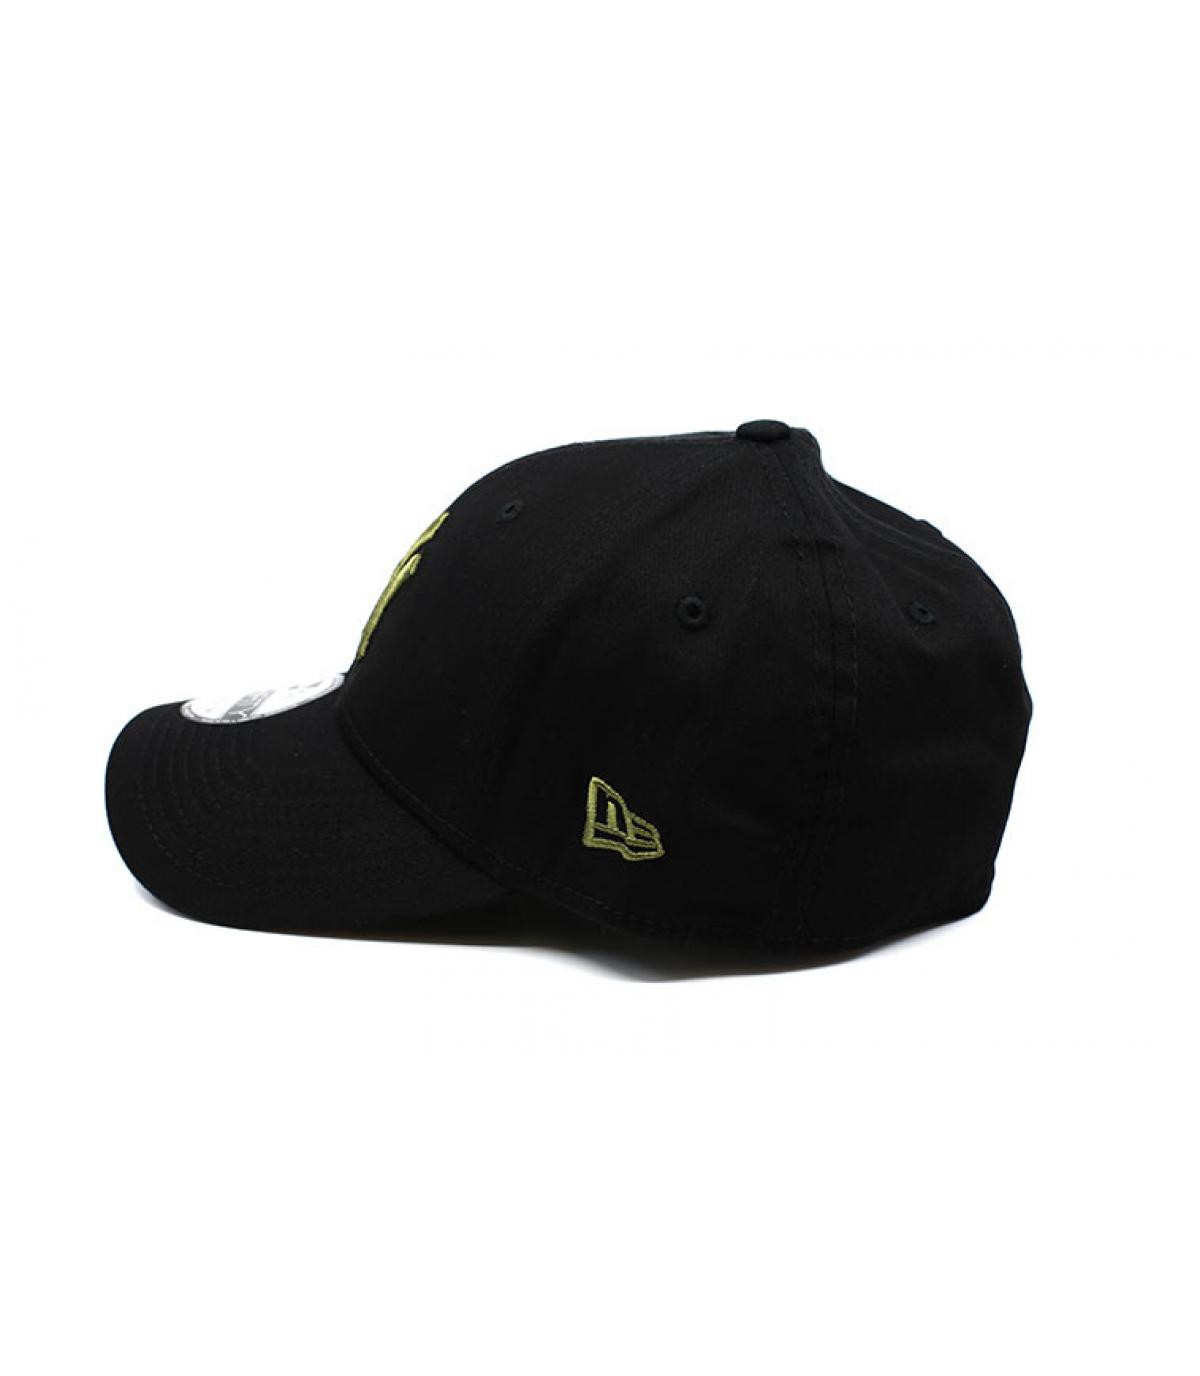 Details Cap League Ess NY 39Thirty black olive - Abbildung 4